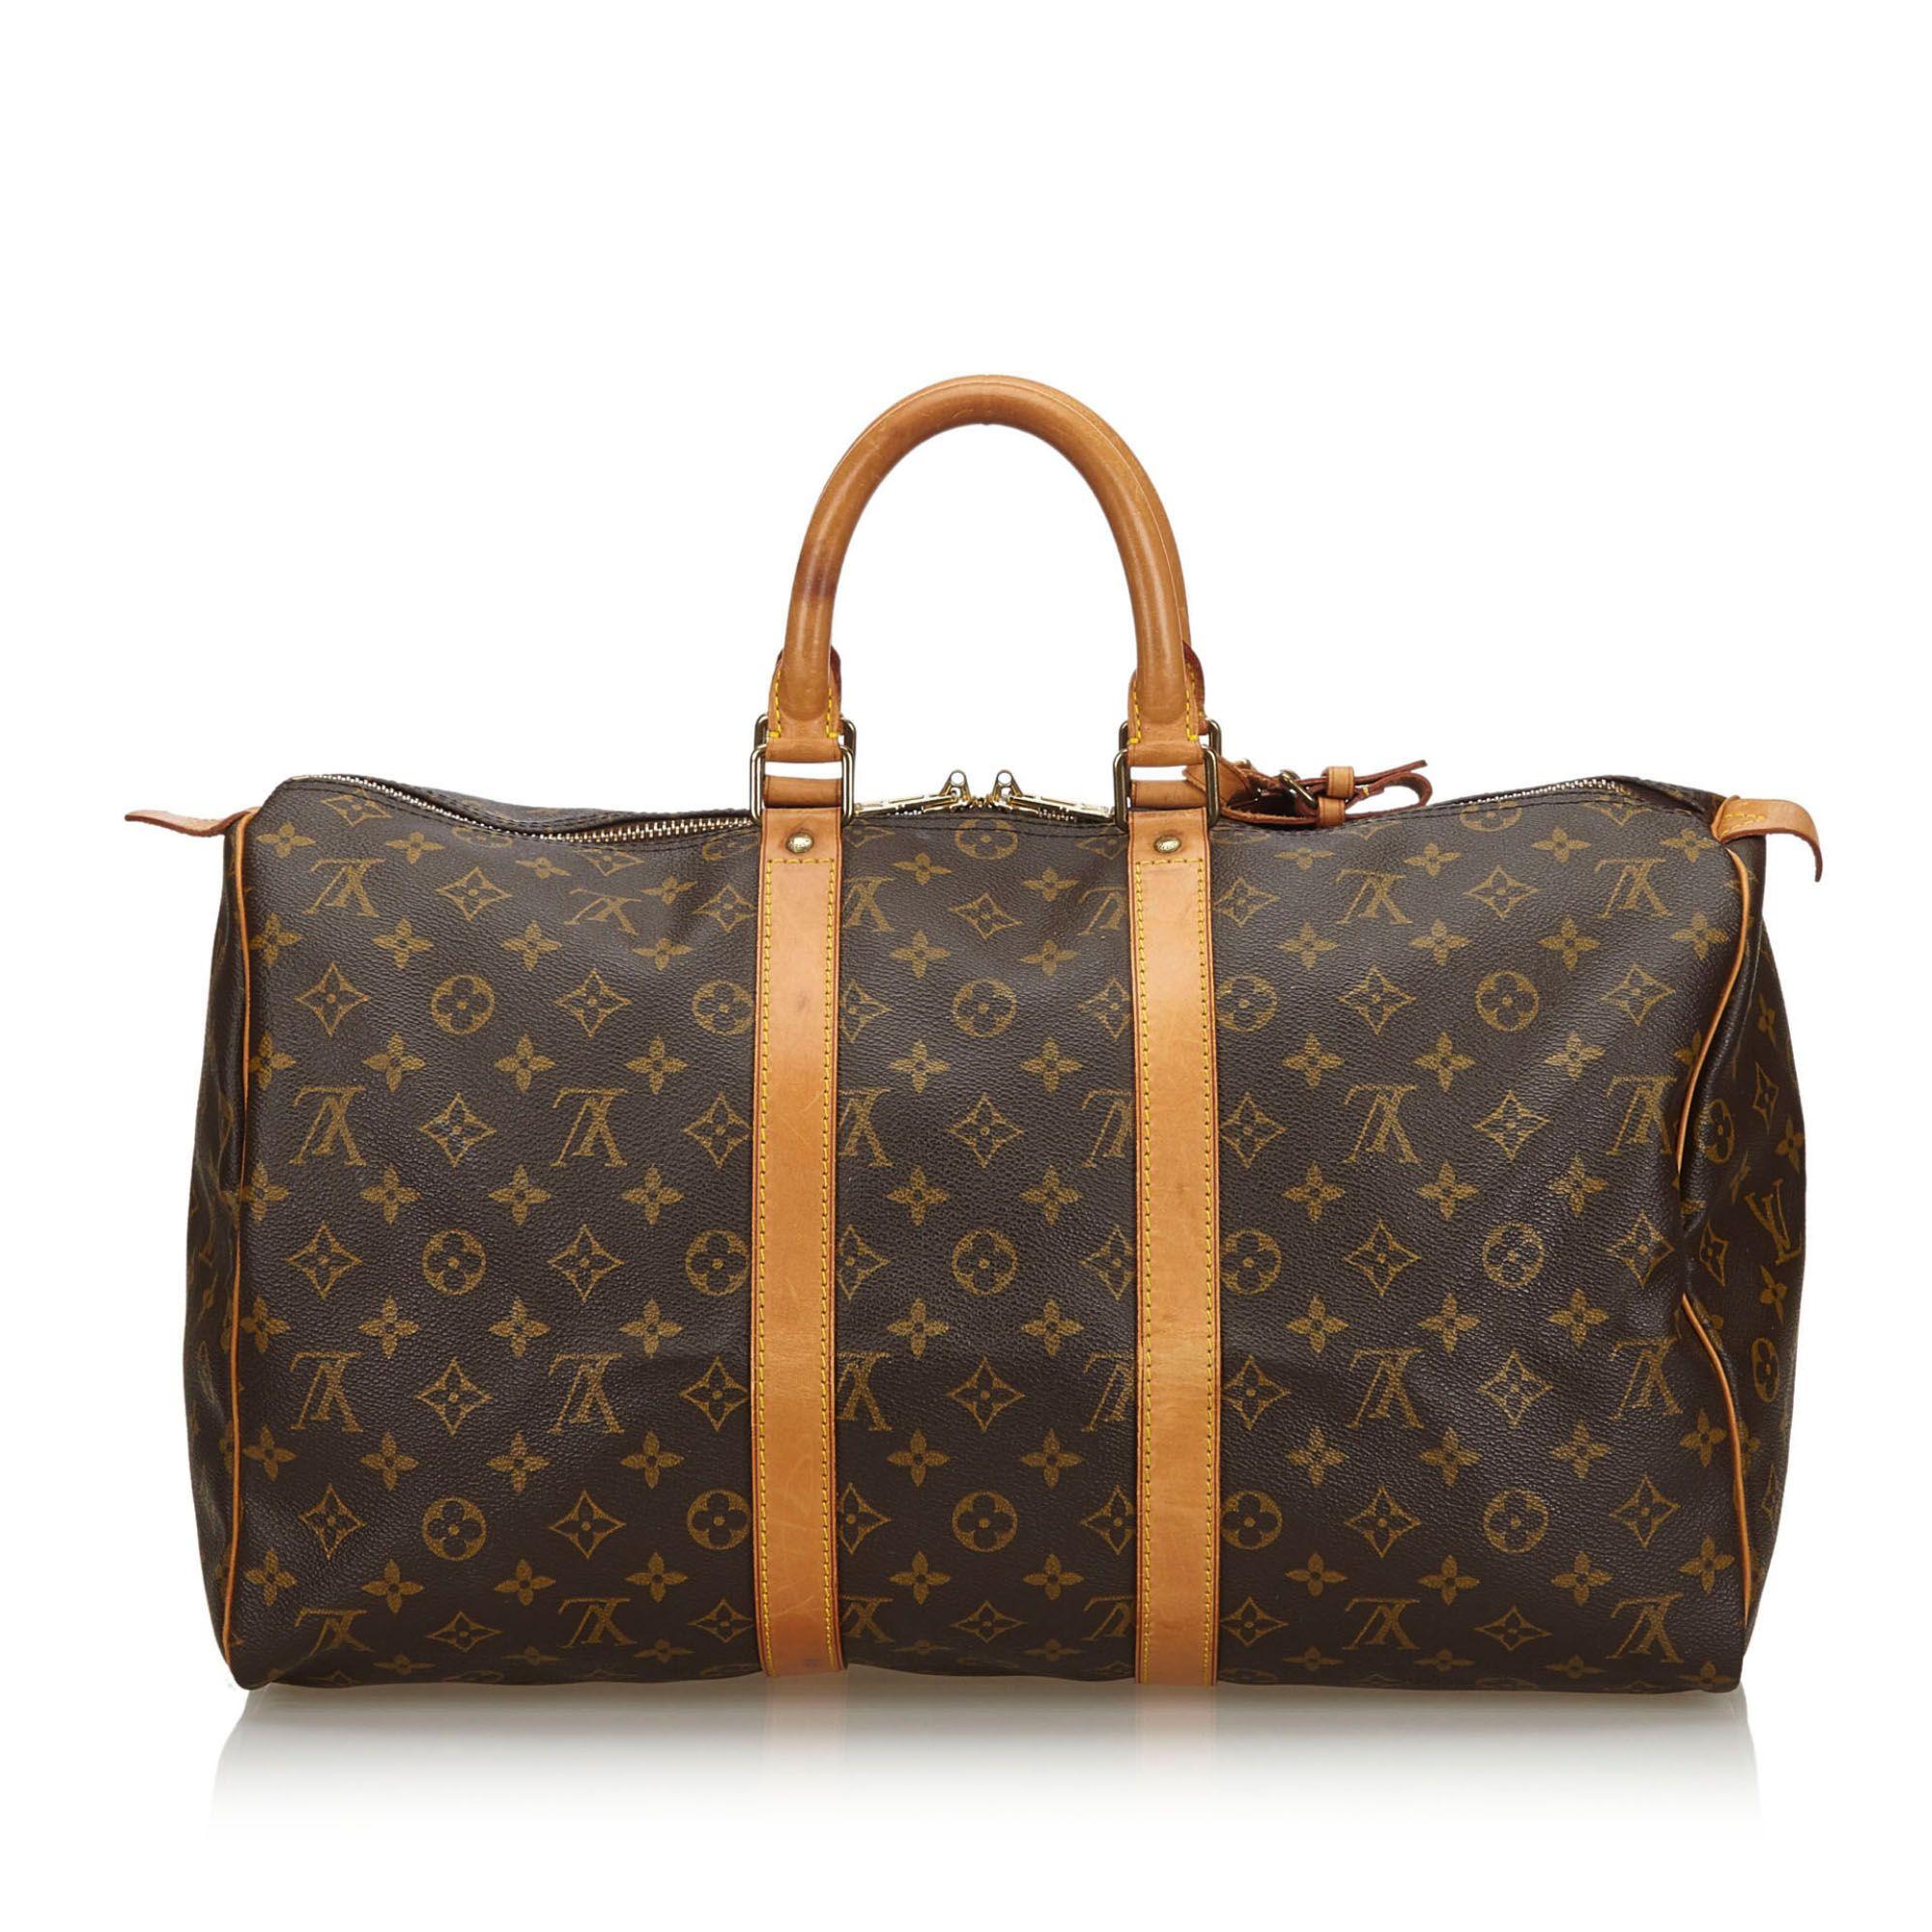 Vintage Louis Vuitton Monogram Keepall 45 Brown